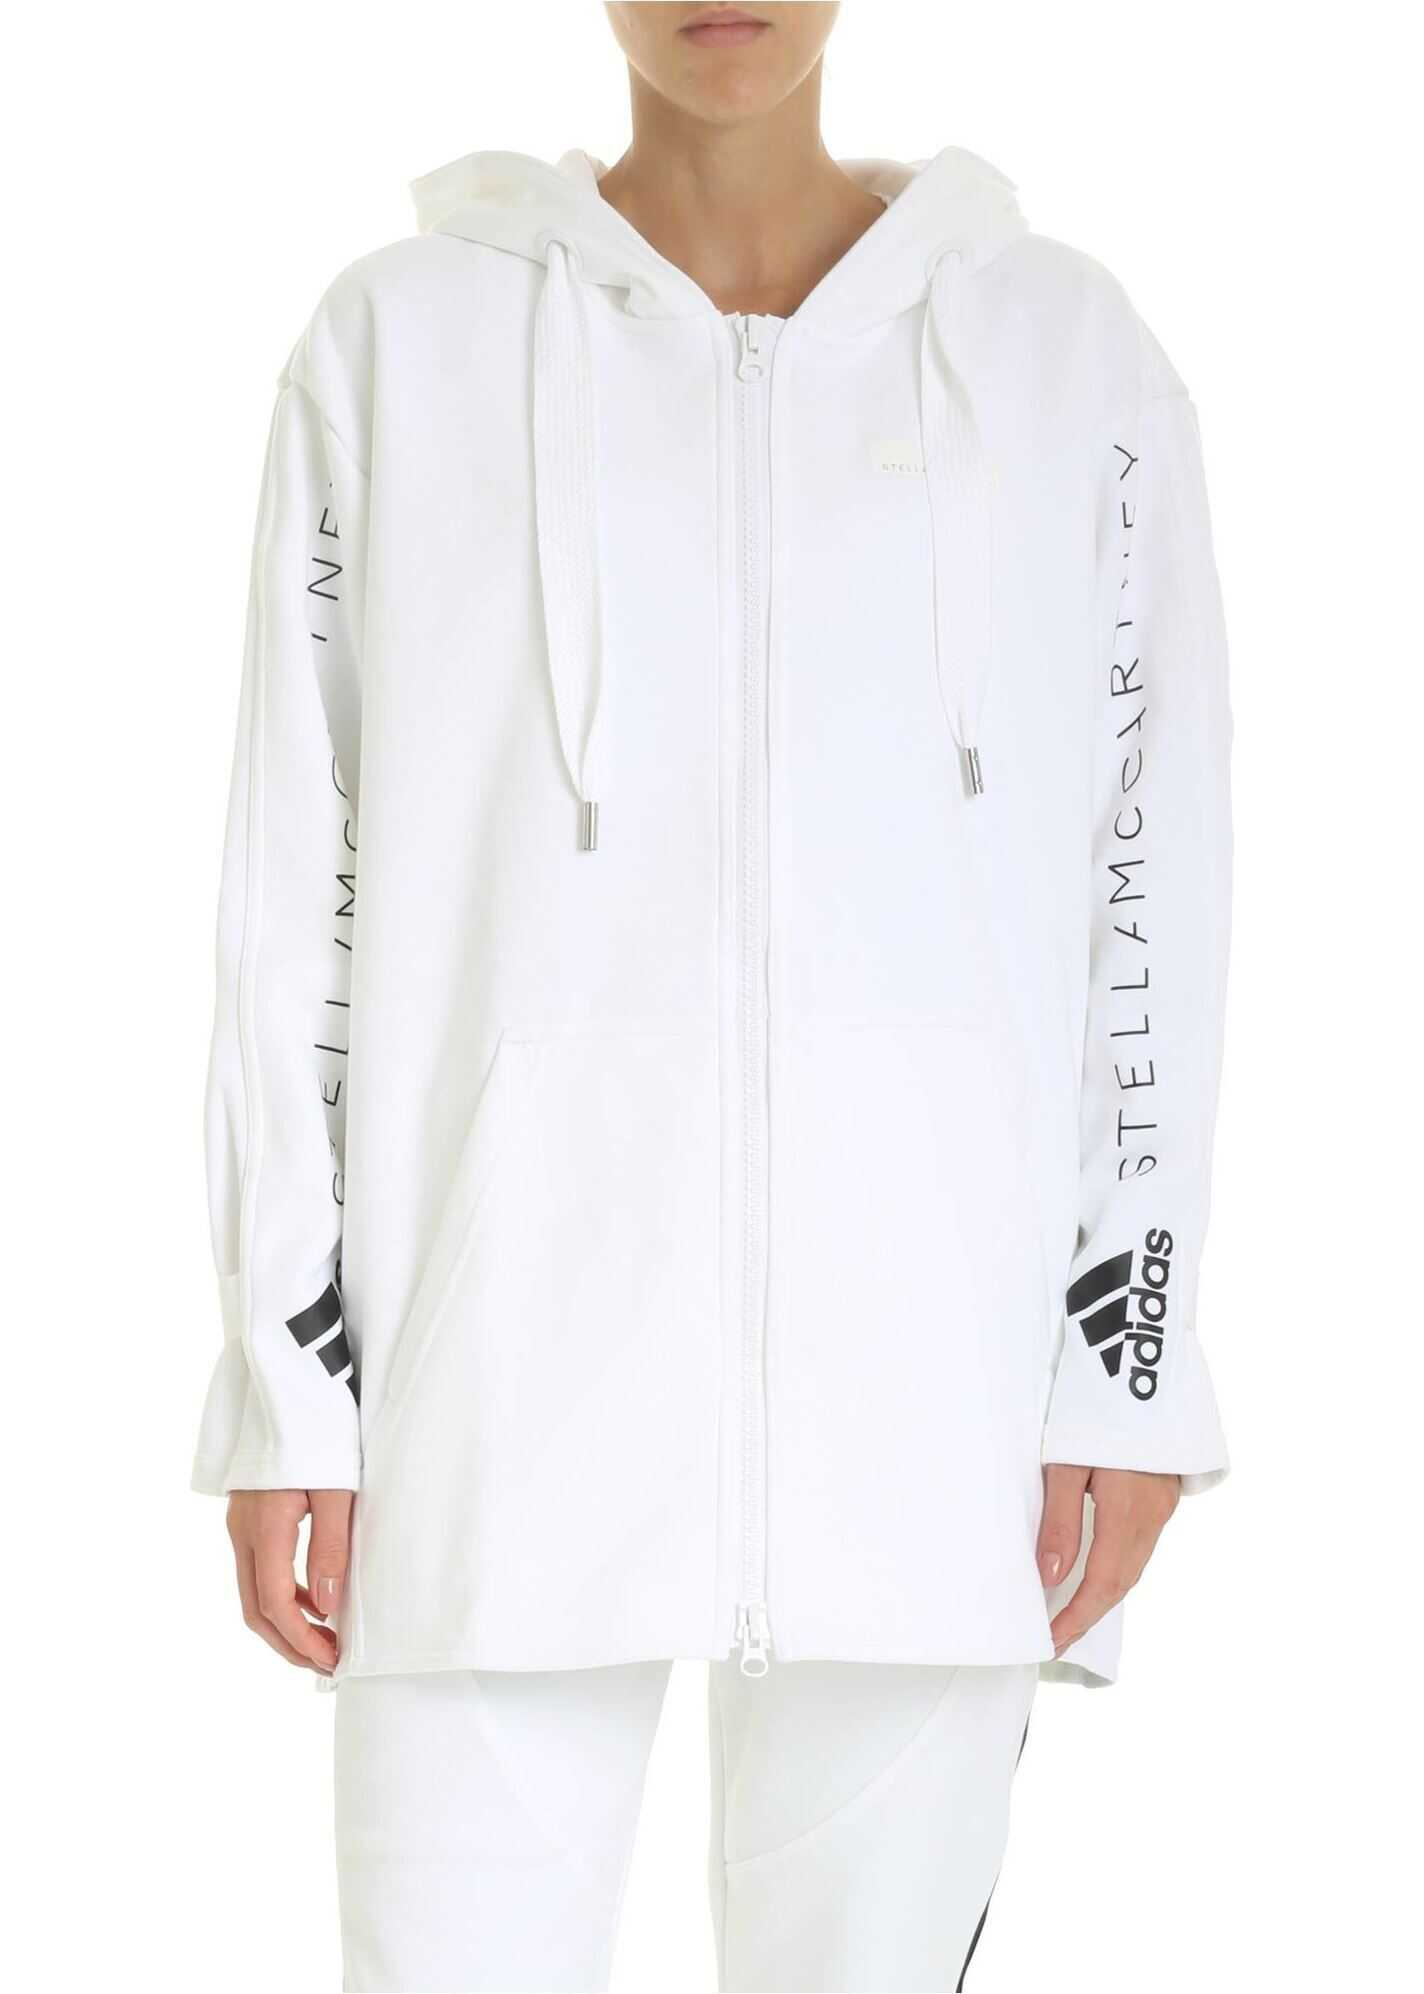 adidas by Stella McCartney Oversized Hood Sweatshirt In White White